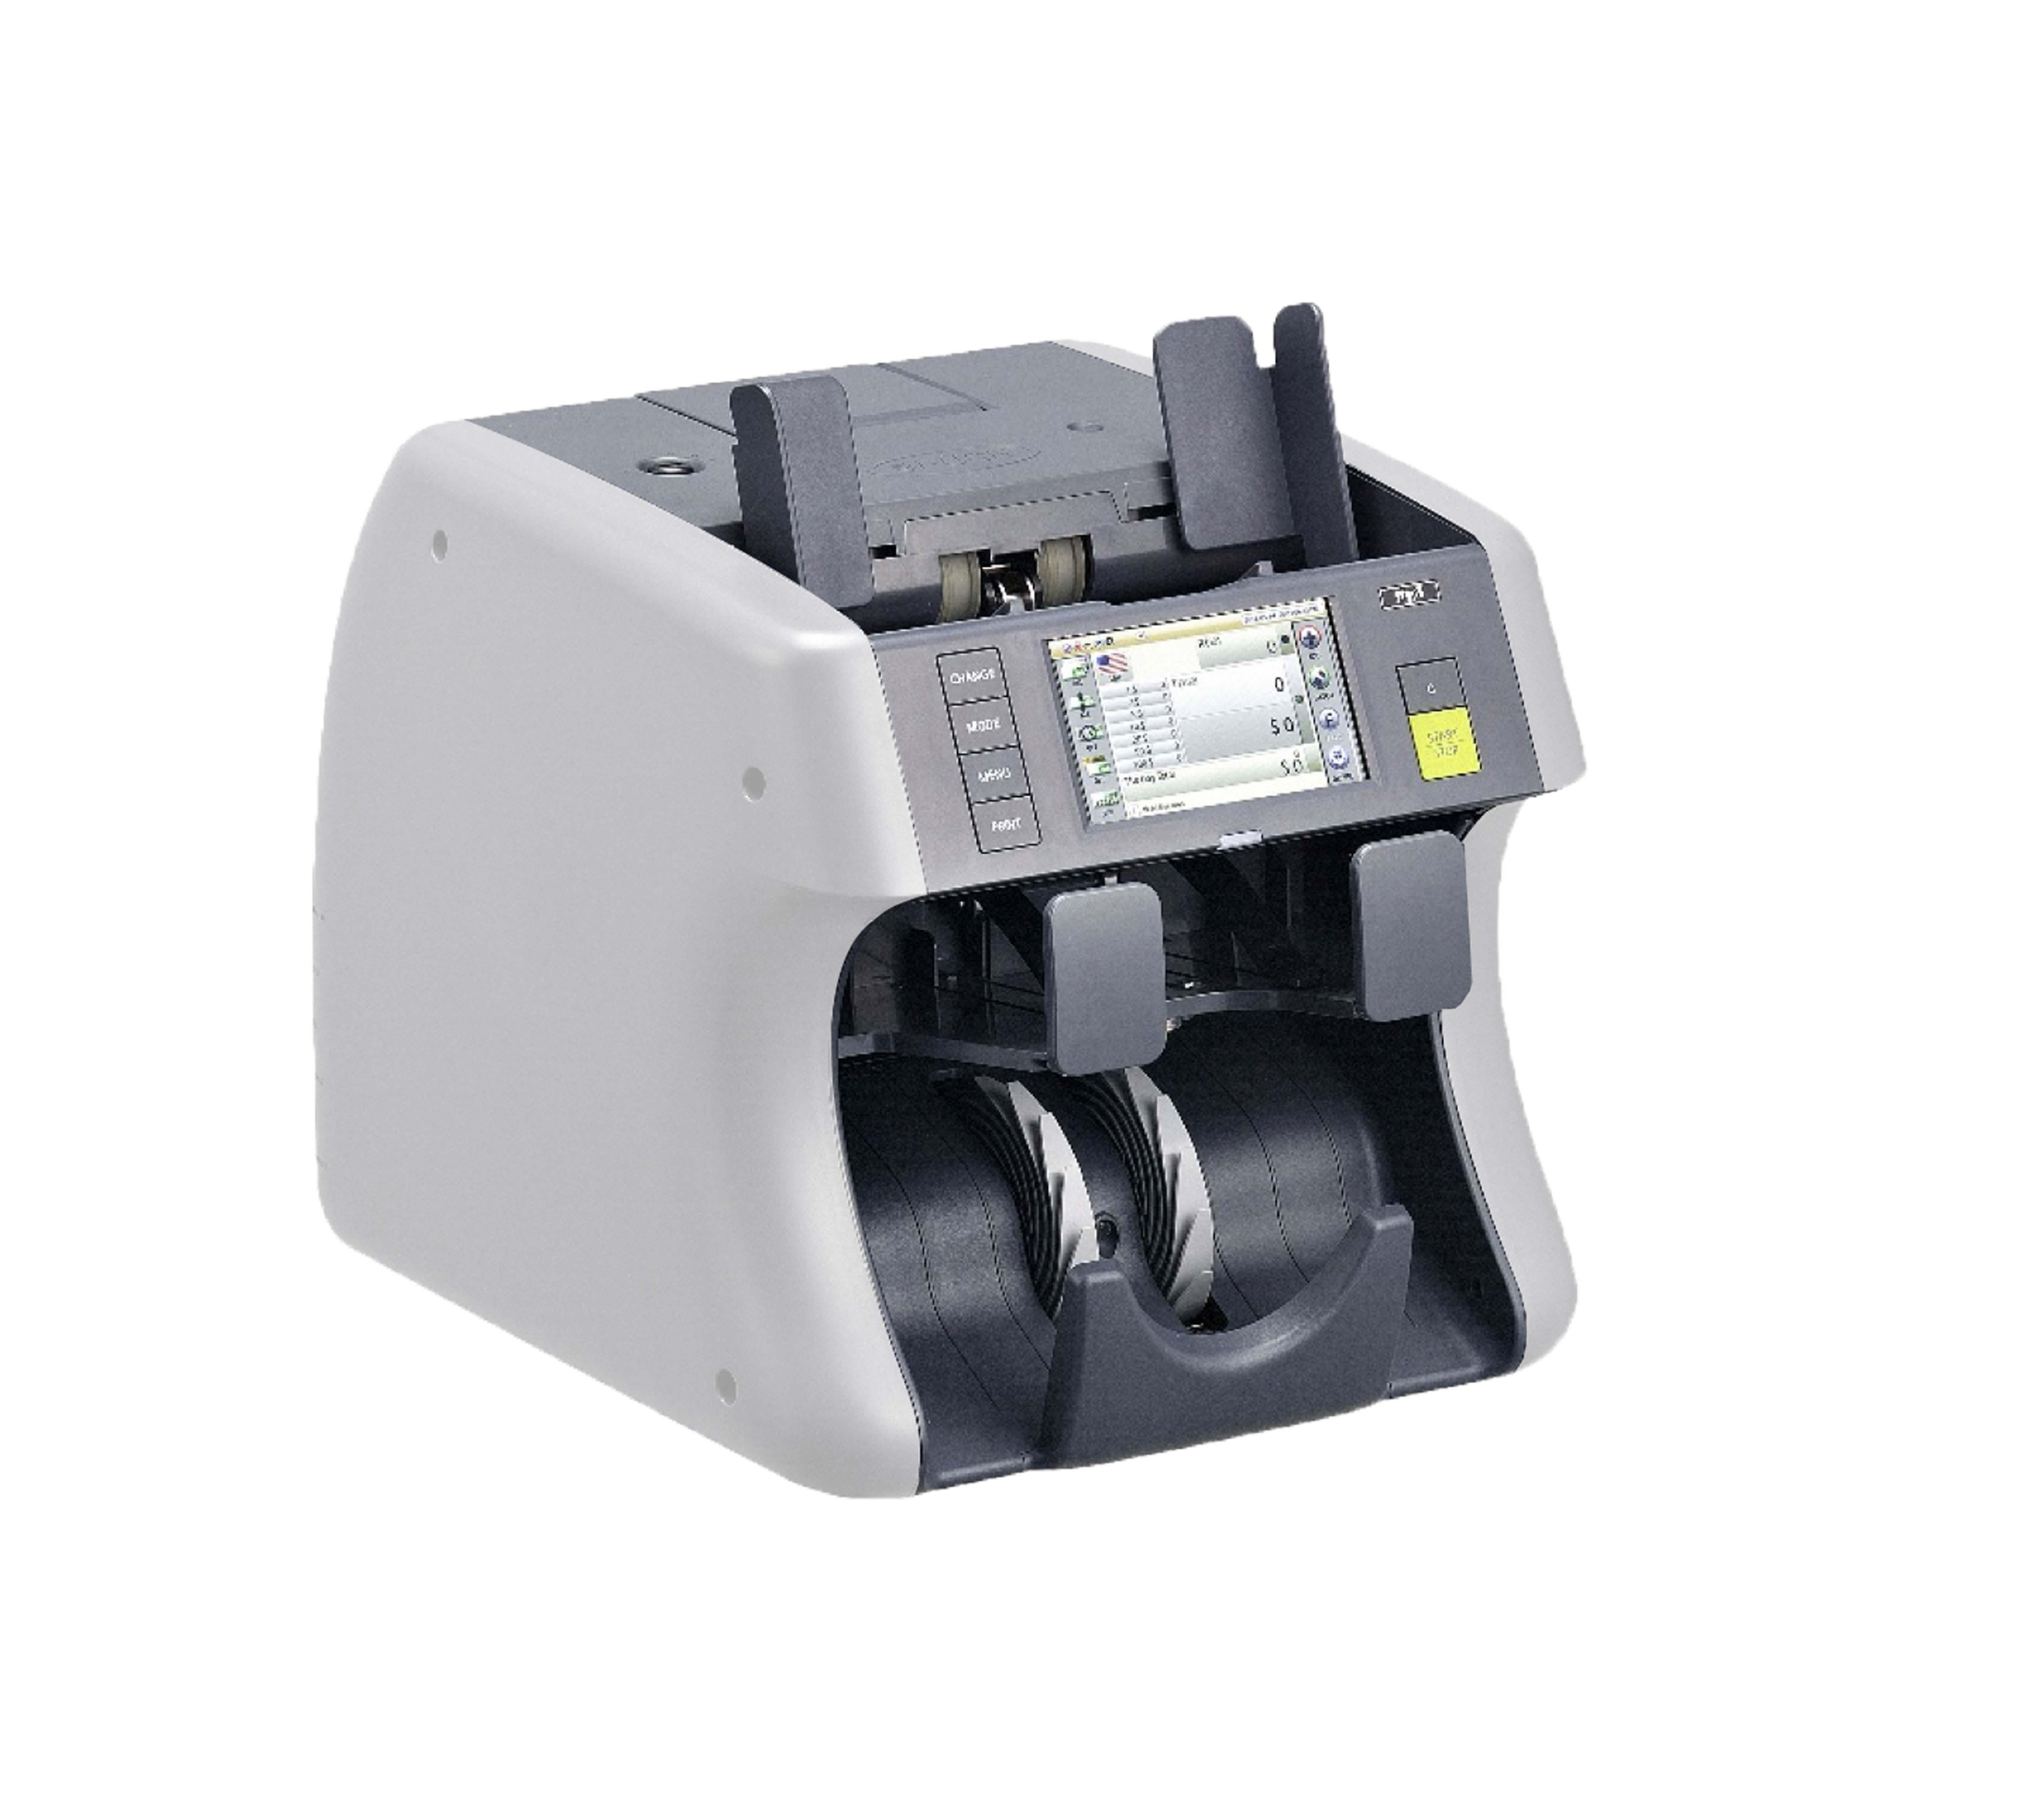 Multi Cash MIB-11V/F - Banknotenzähler